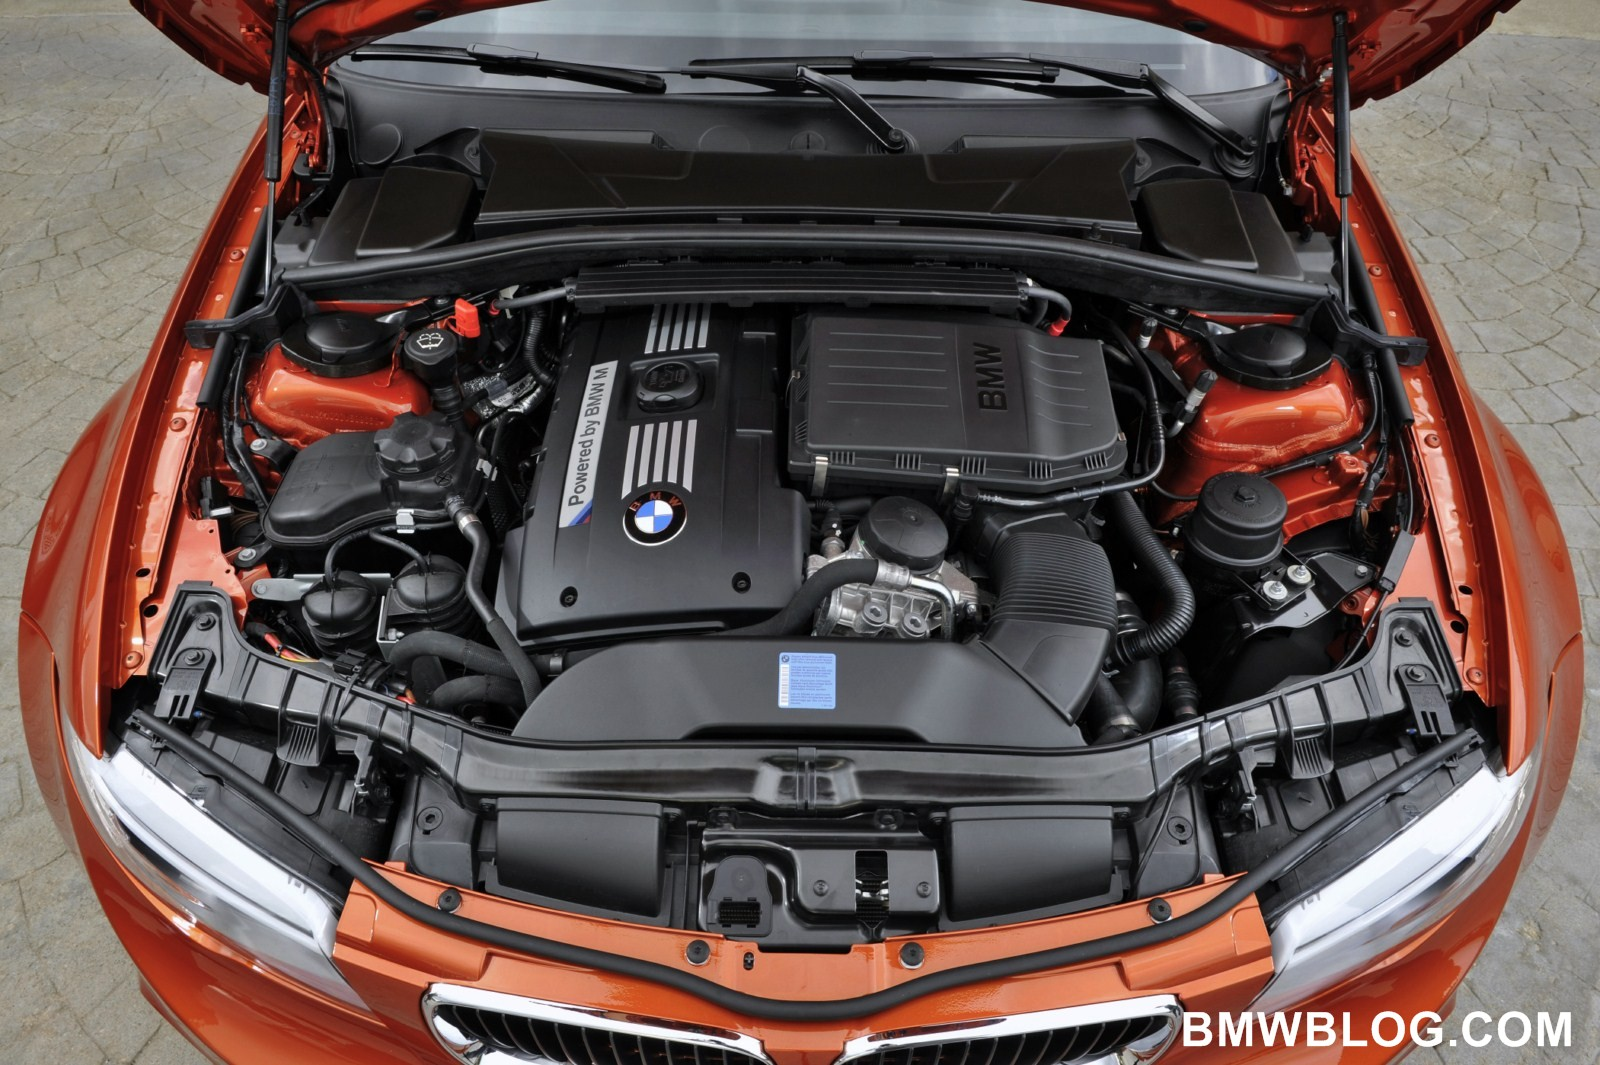 world premiere bmw 1 series m coupe world premiere bmw 1 series m coupe